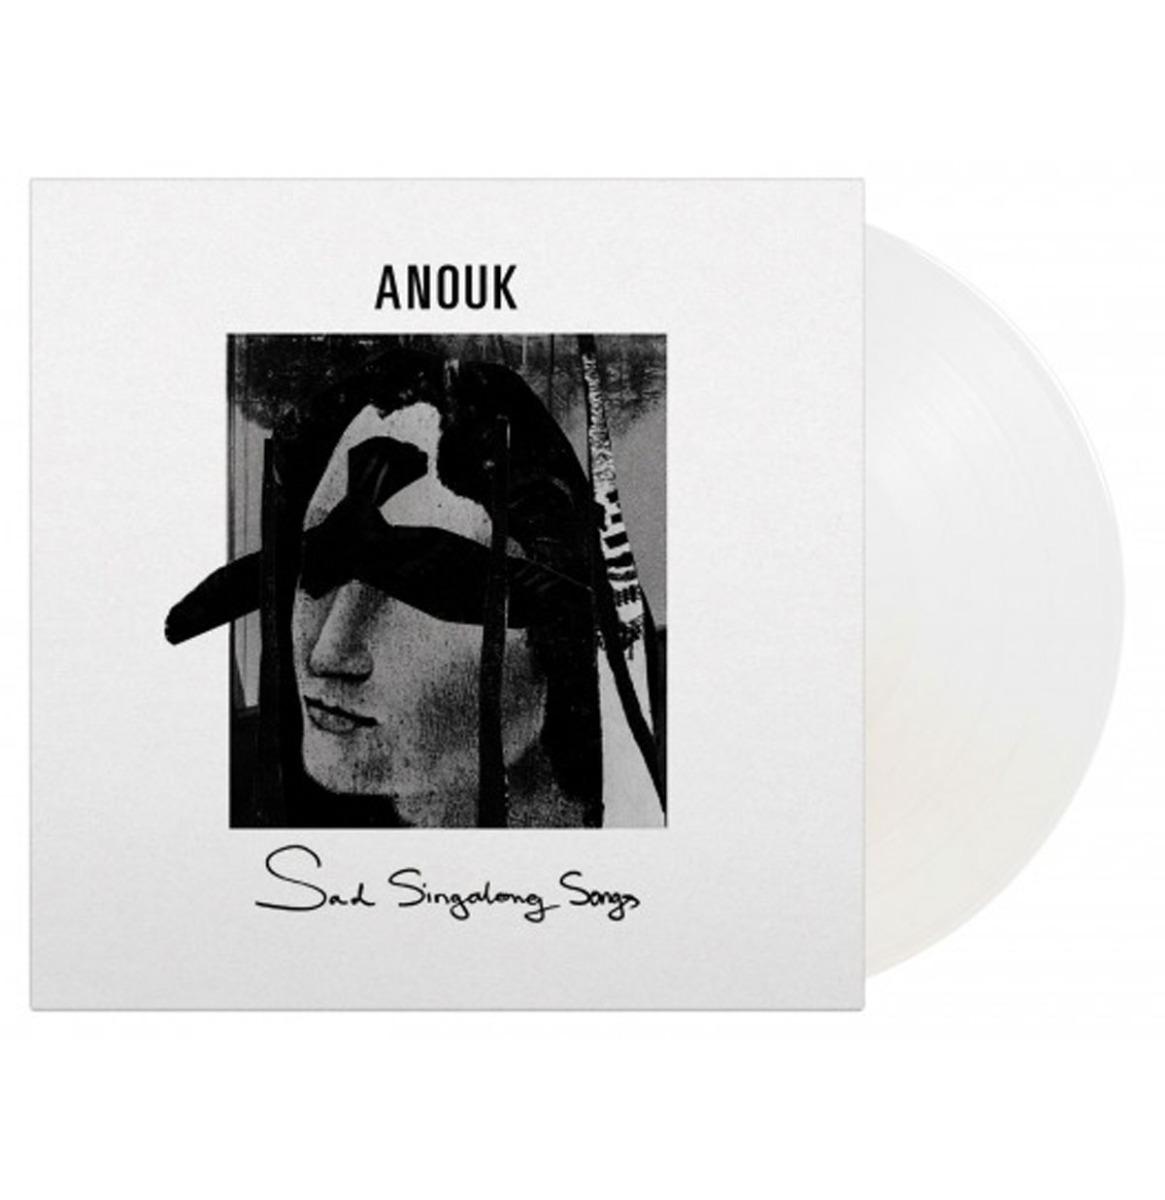 Anouk - Sad Singalong Songs (Clear Vinyl) LP